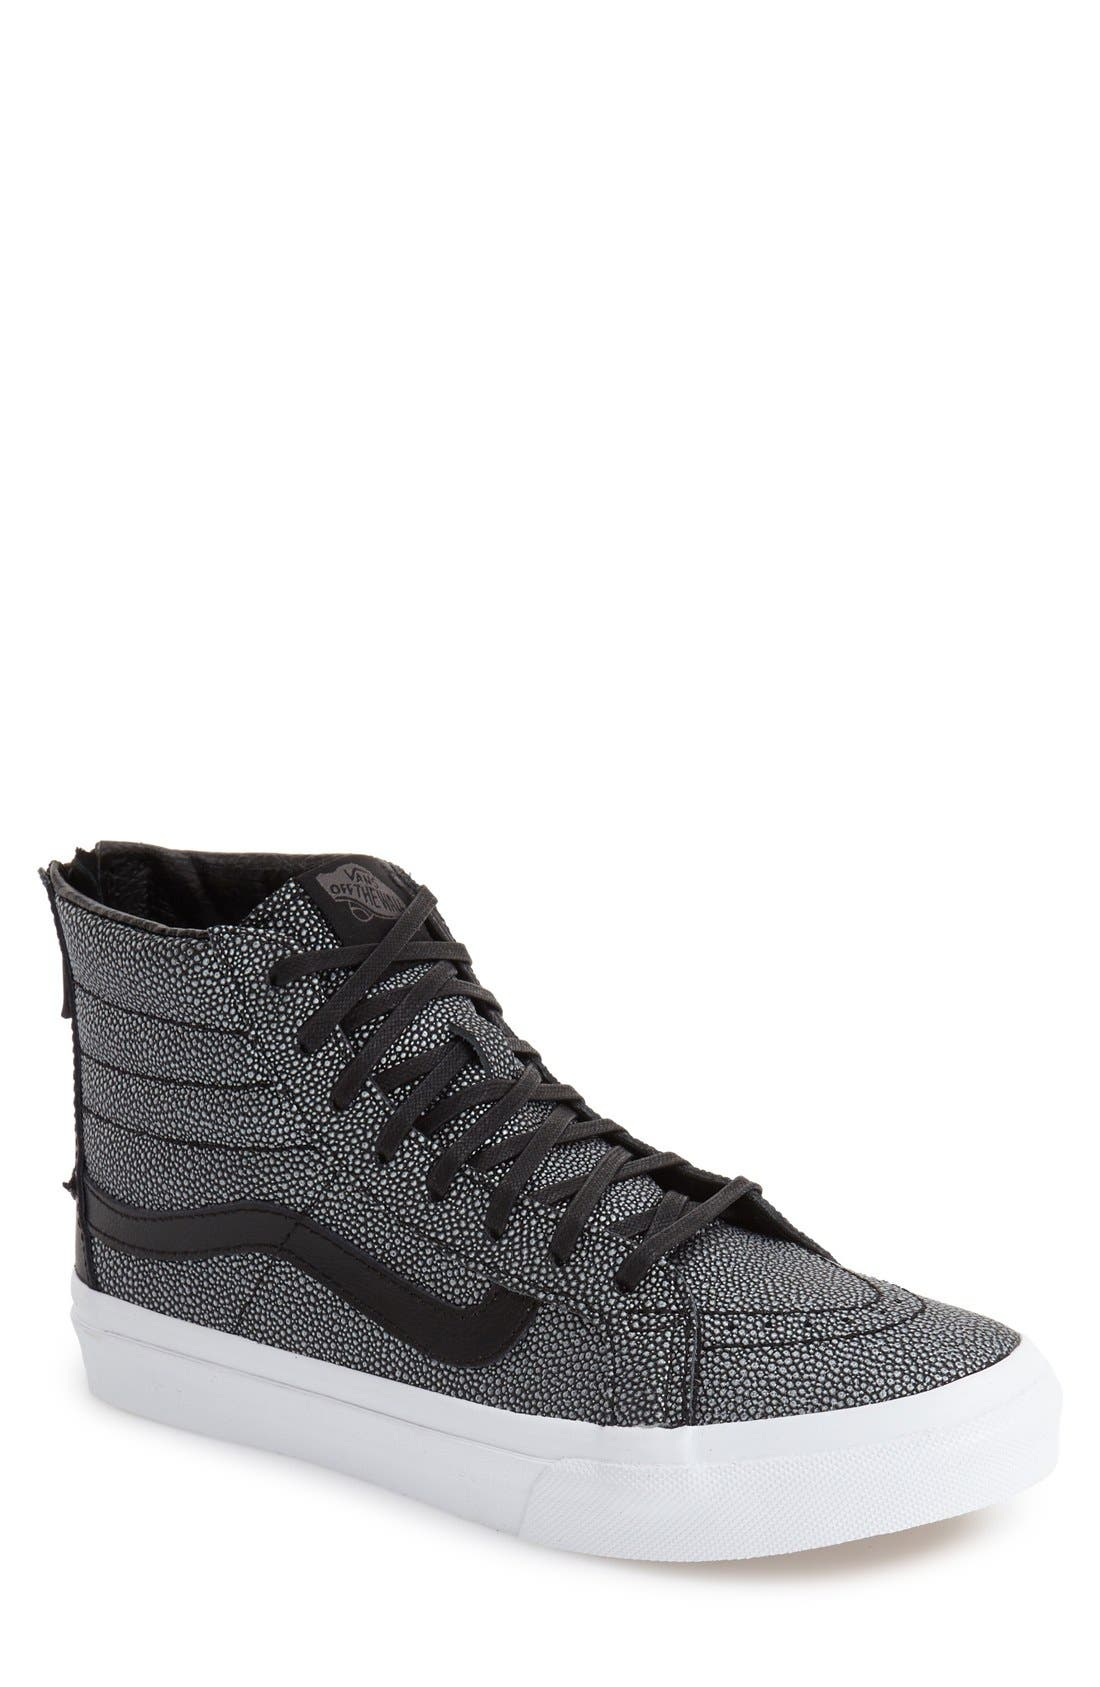 Main Image - Vans 'Sk8-Hi' Slim Zip Sneaker (Women)